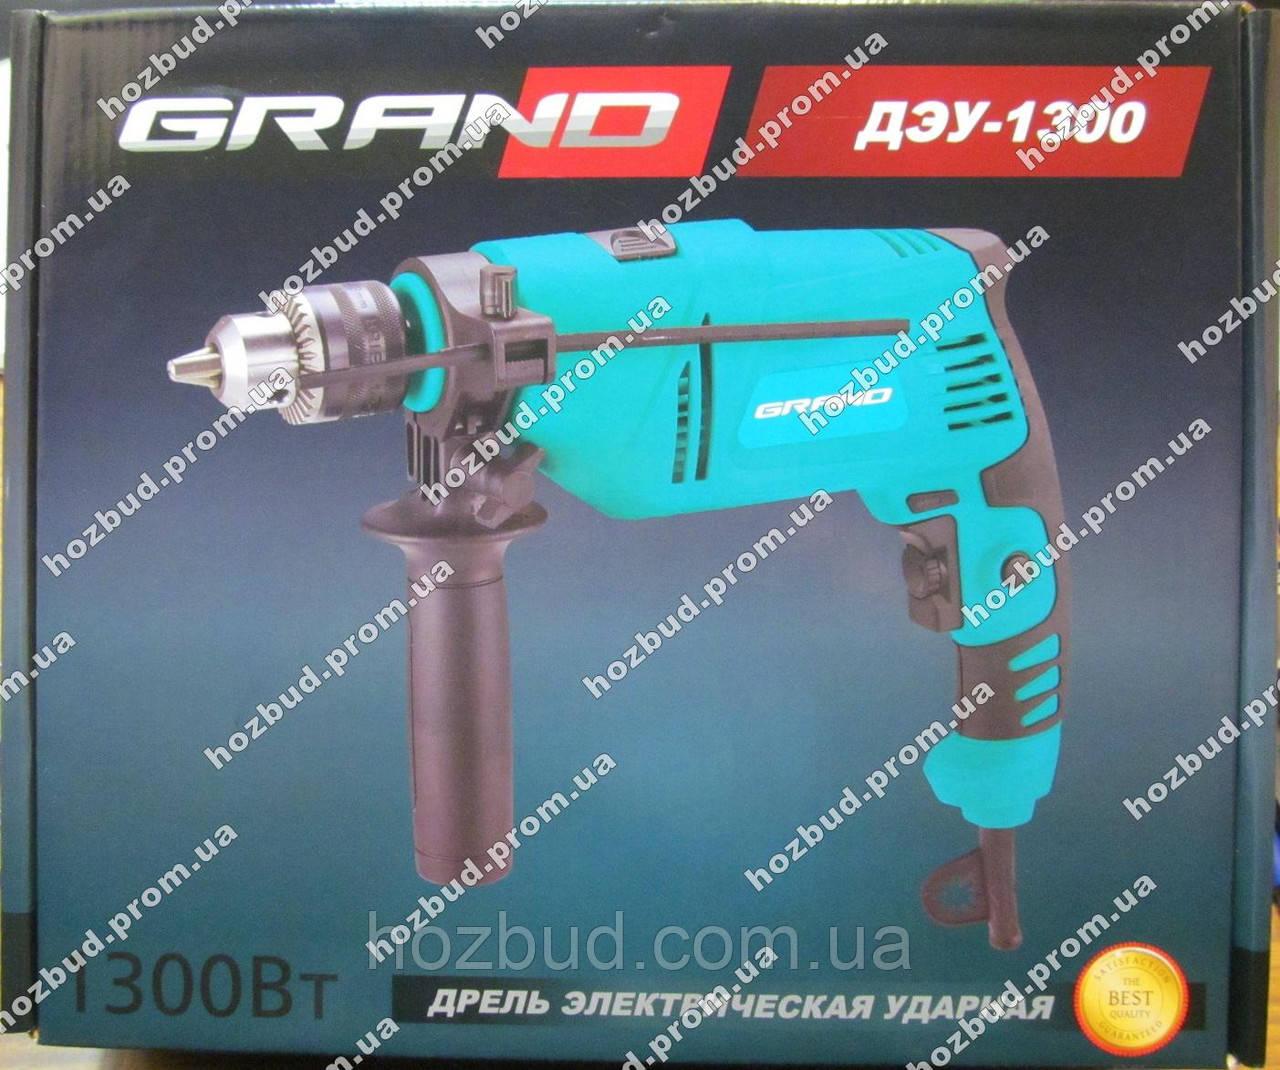 Дрель GRAND ДЭУ-1300